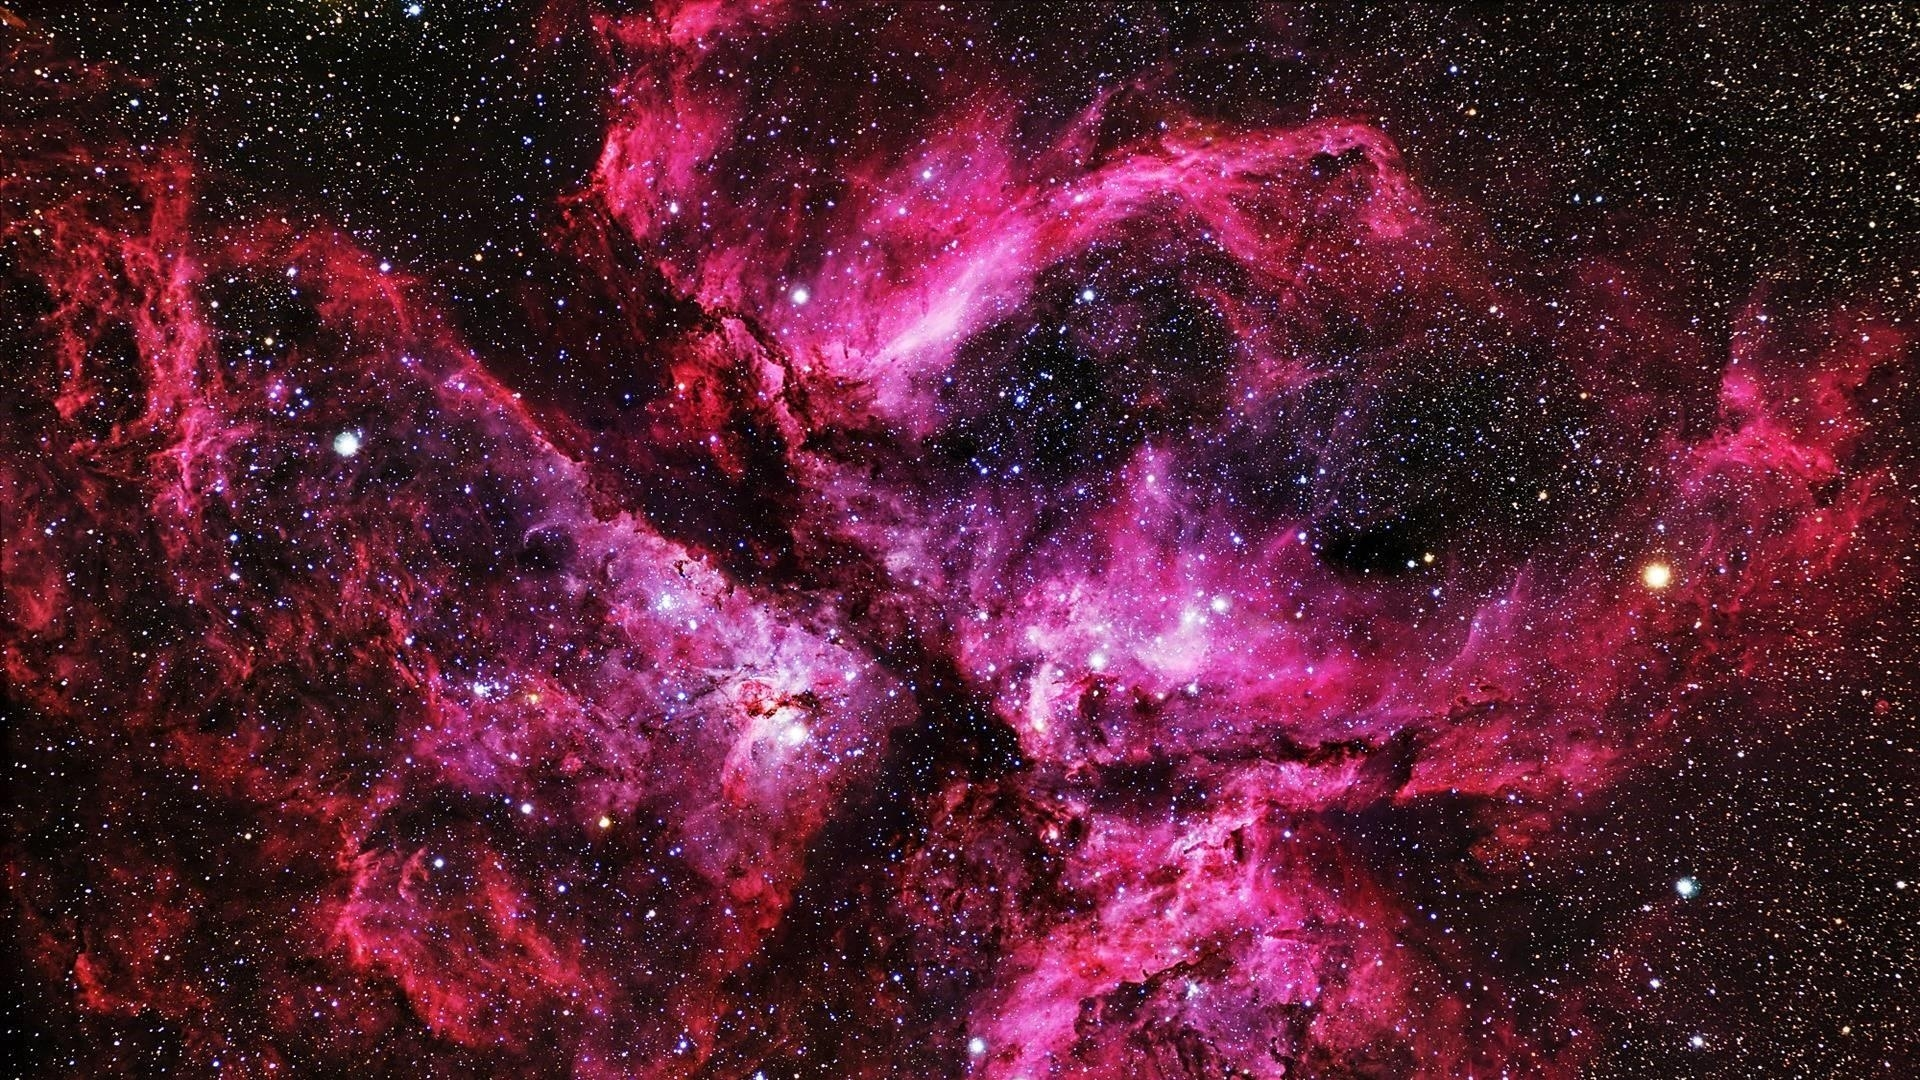 pink galaxy wallpaper | wallpaper studio 10 | tens of thousands hd